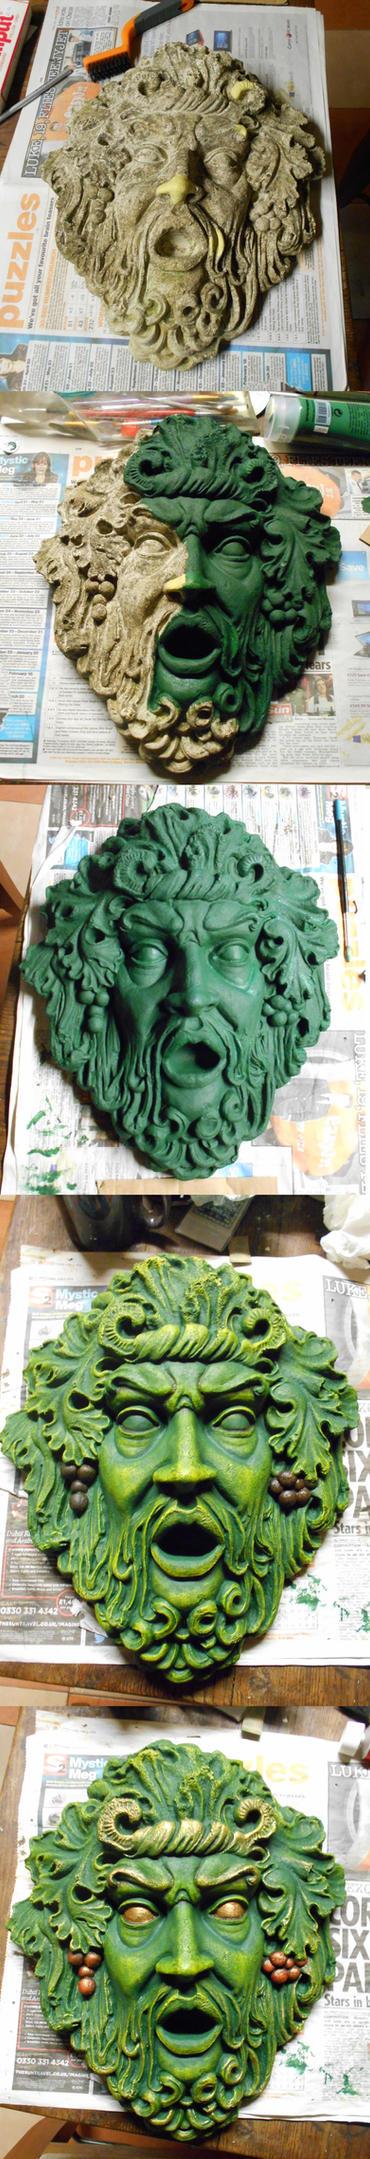 Green Man - painting process by Bluetabbycat